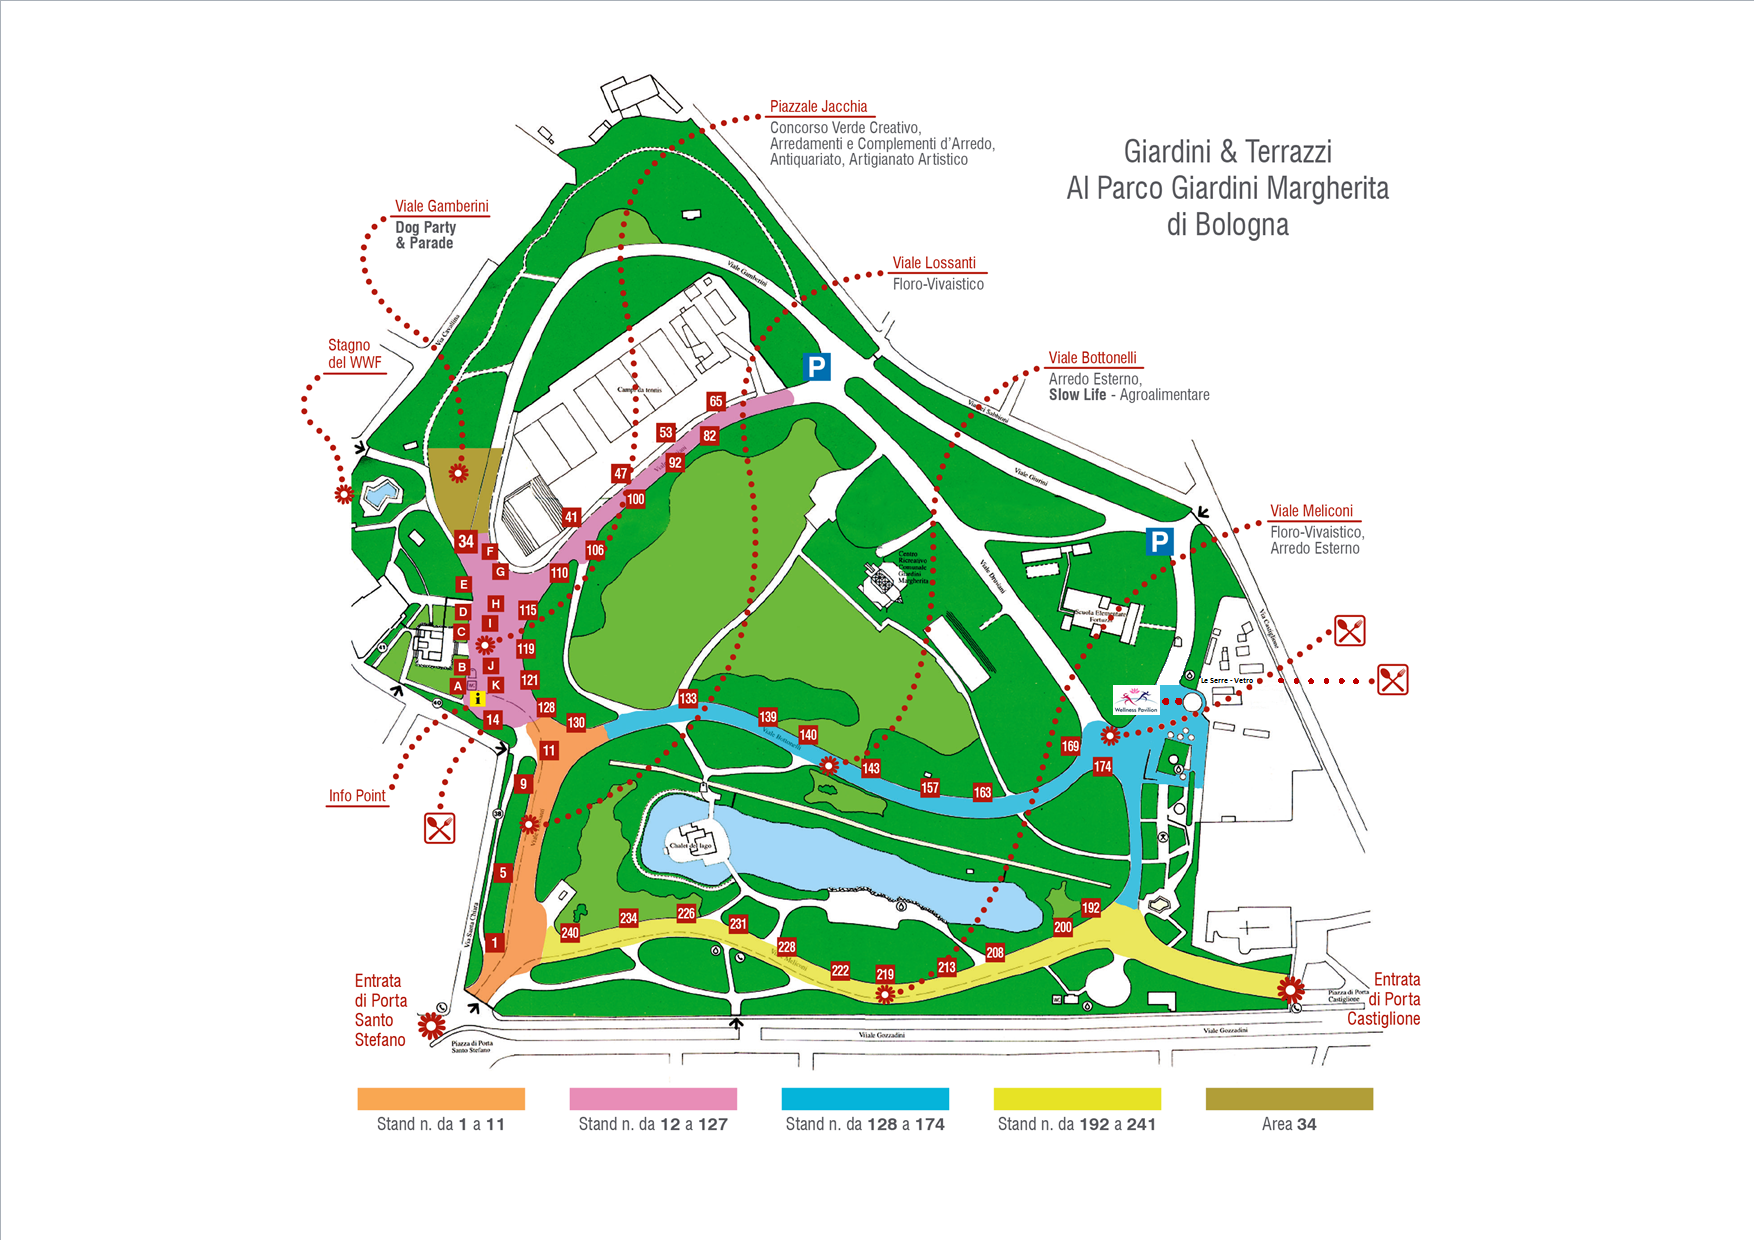 Giardini e terrazzi bologna for Terrazze e giardini bologna 2016